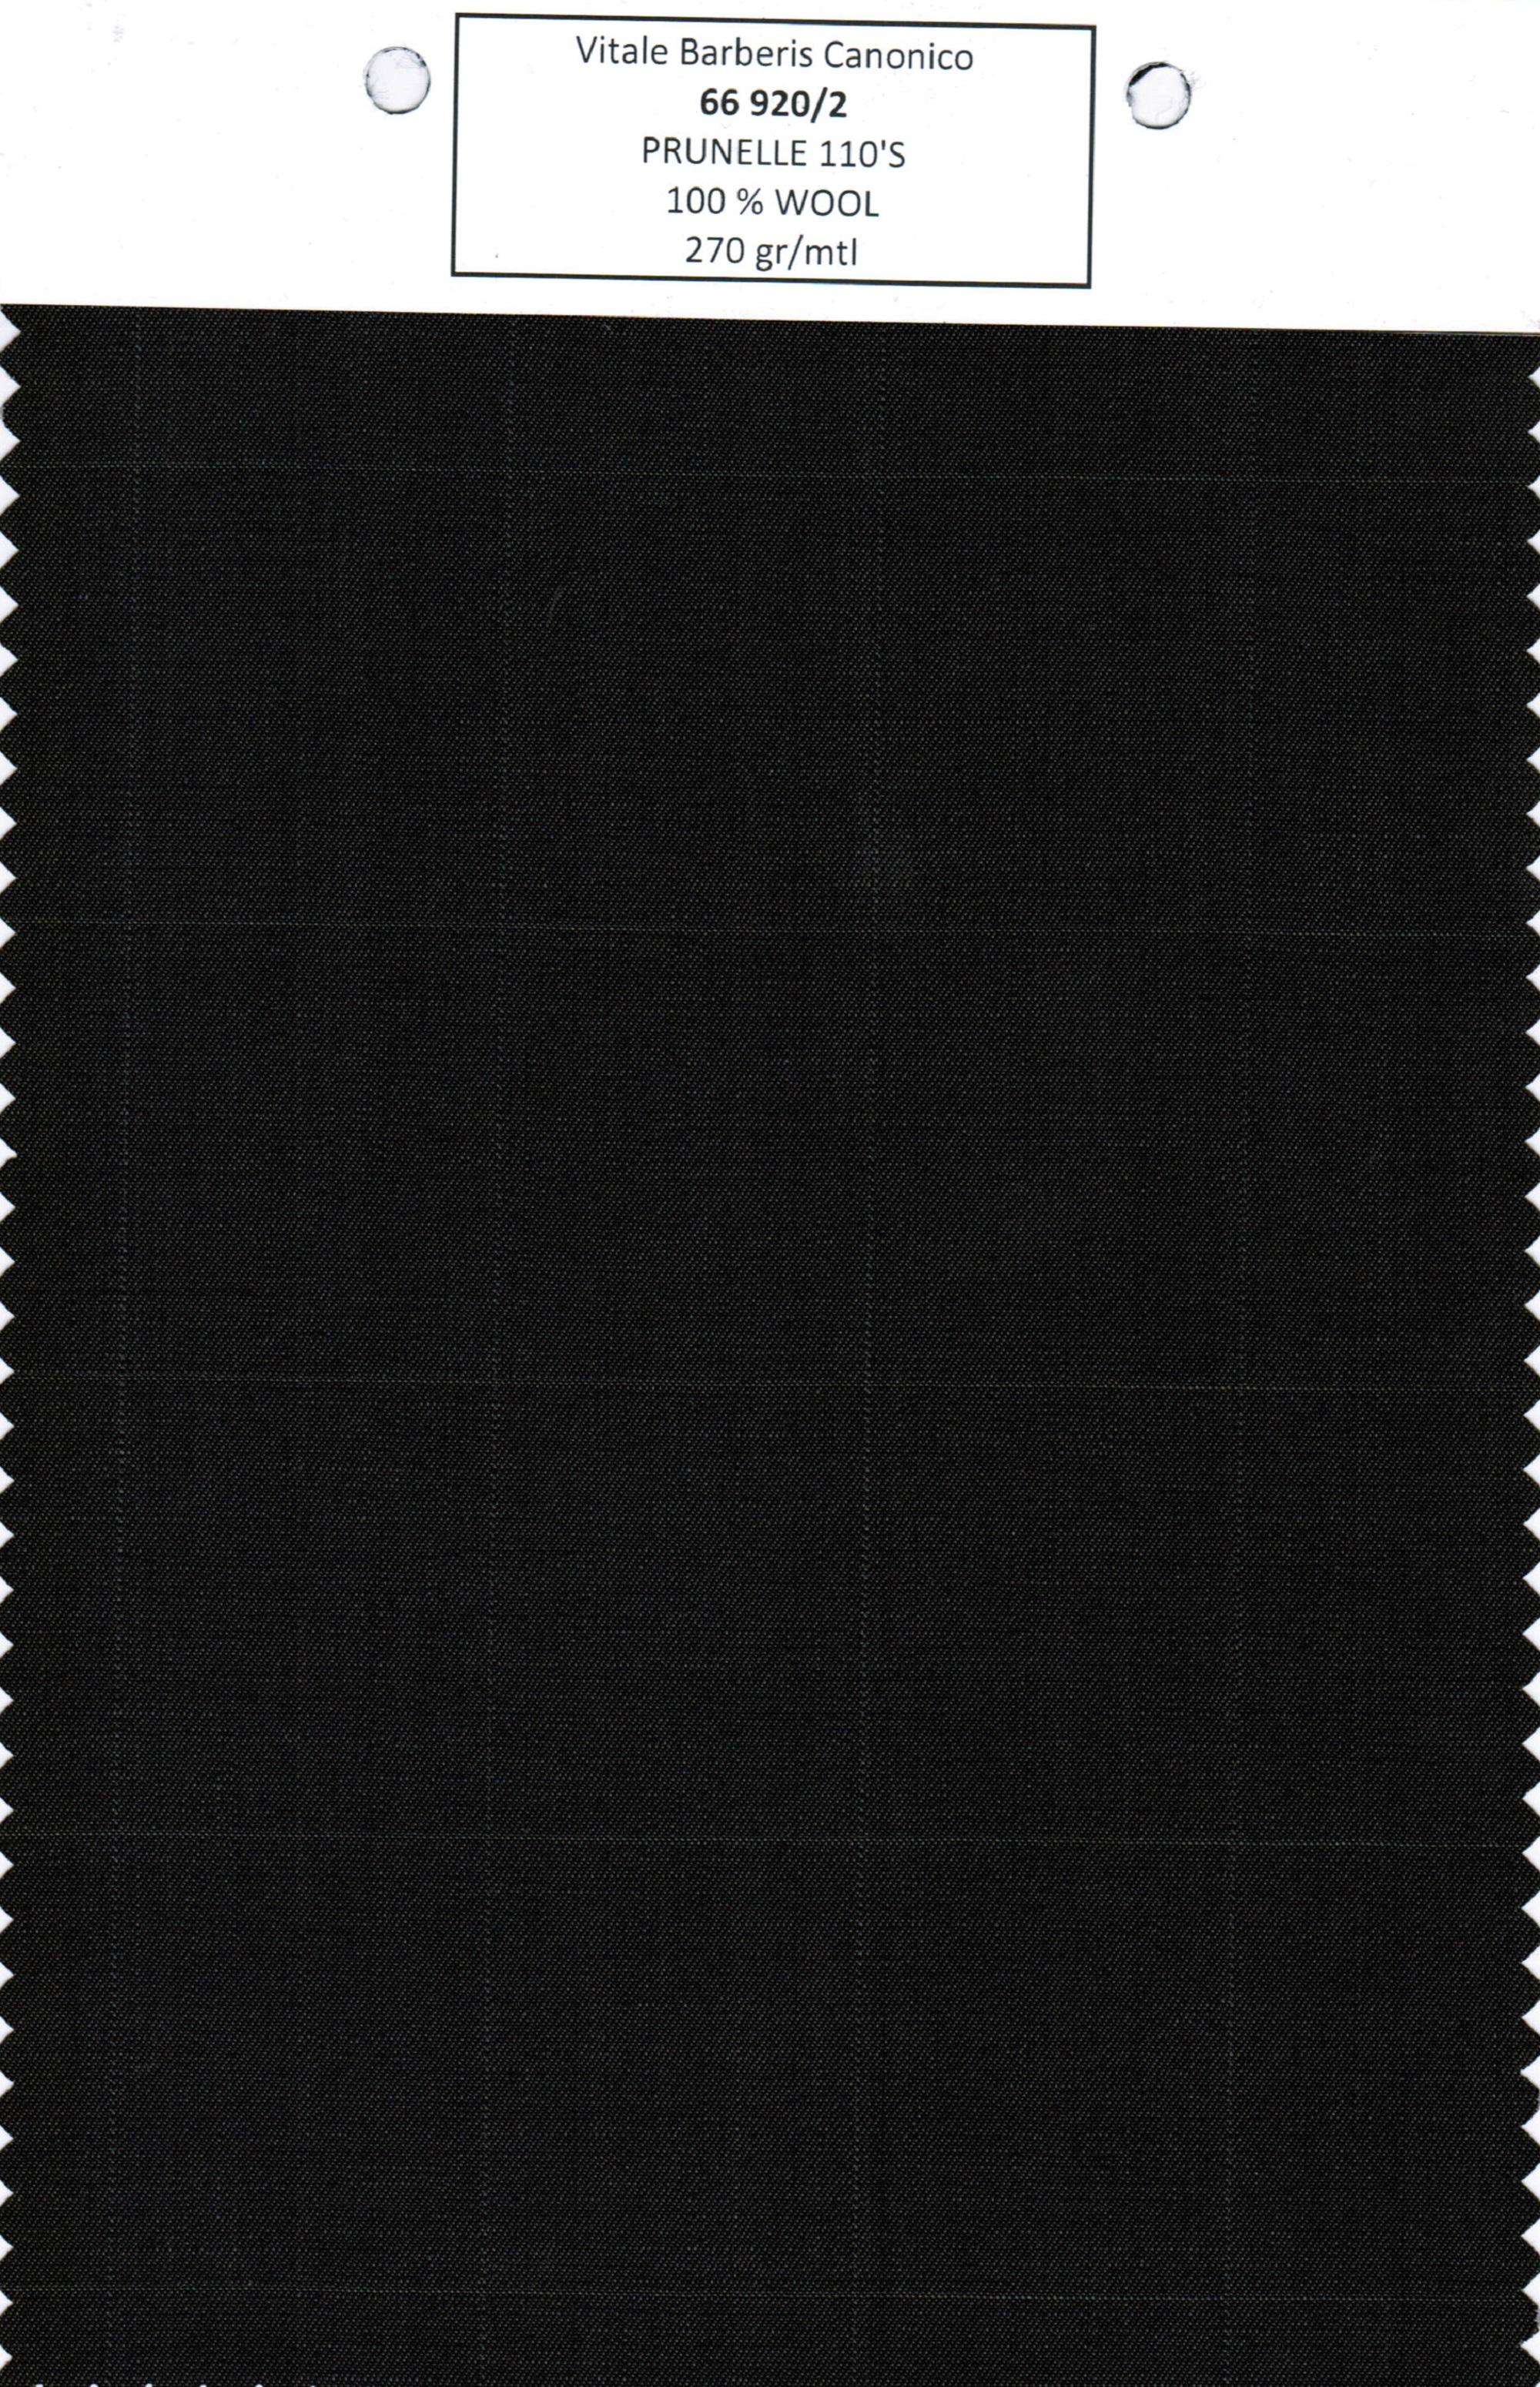 66920-2